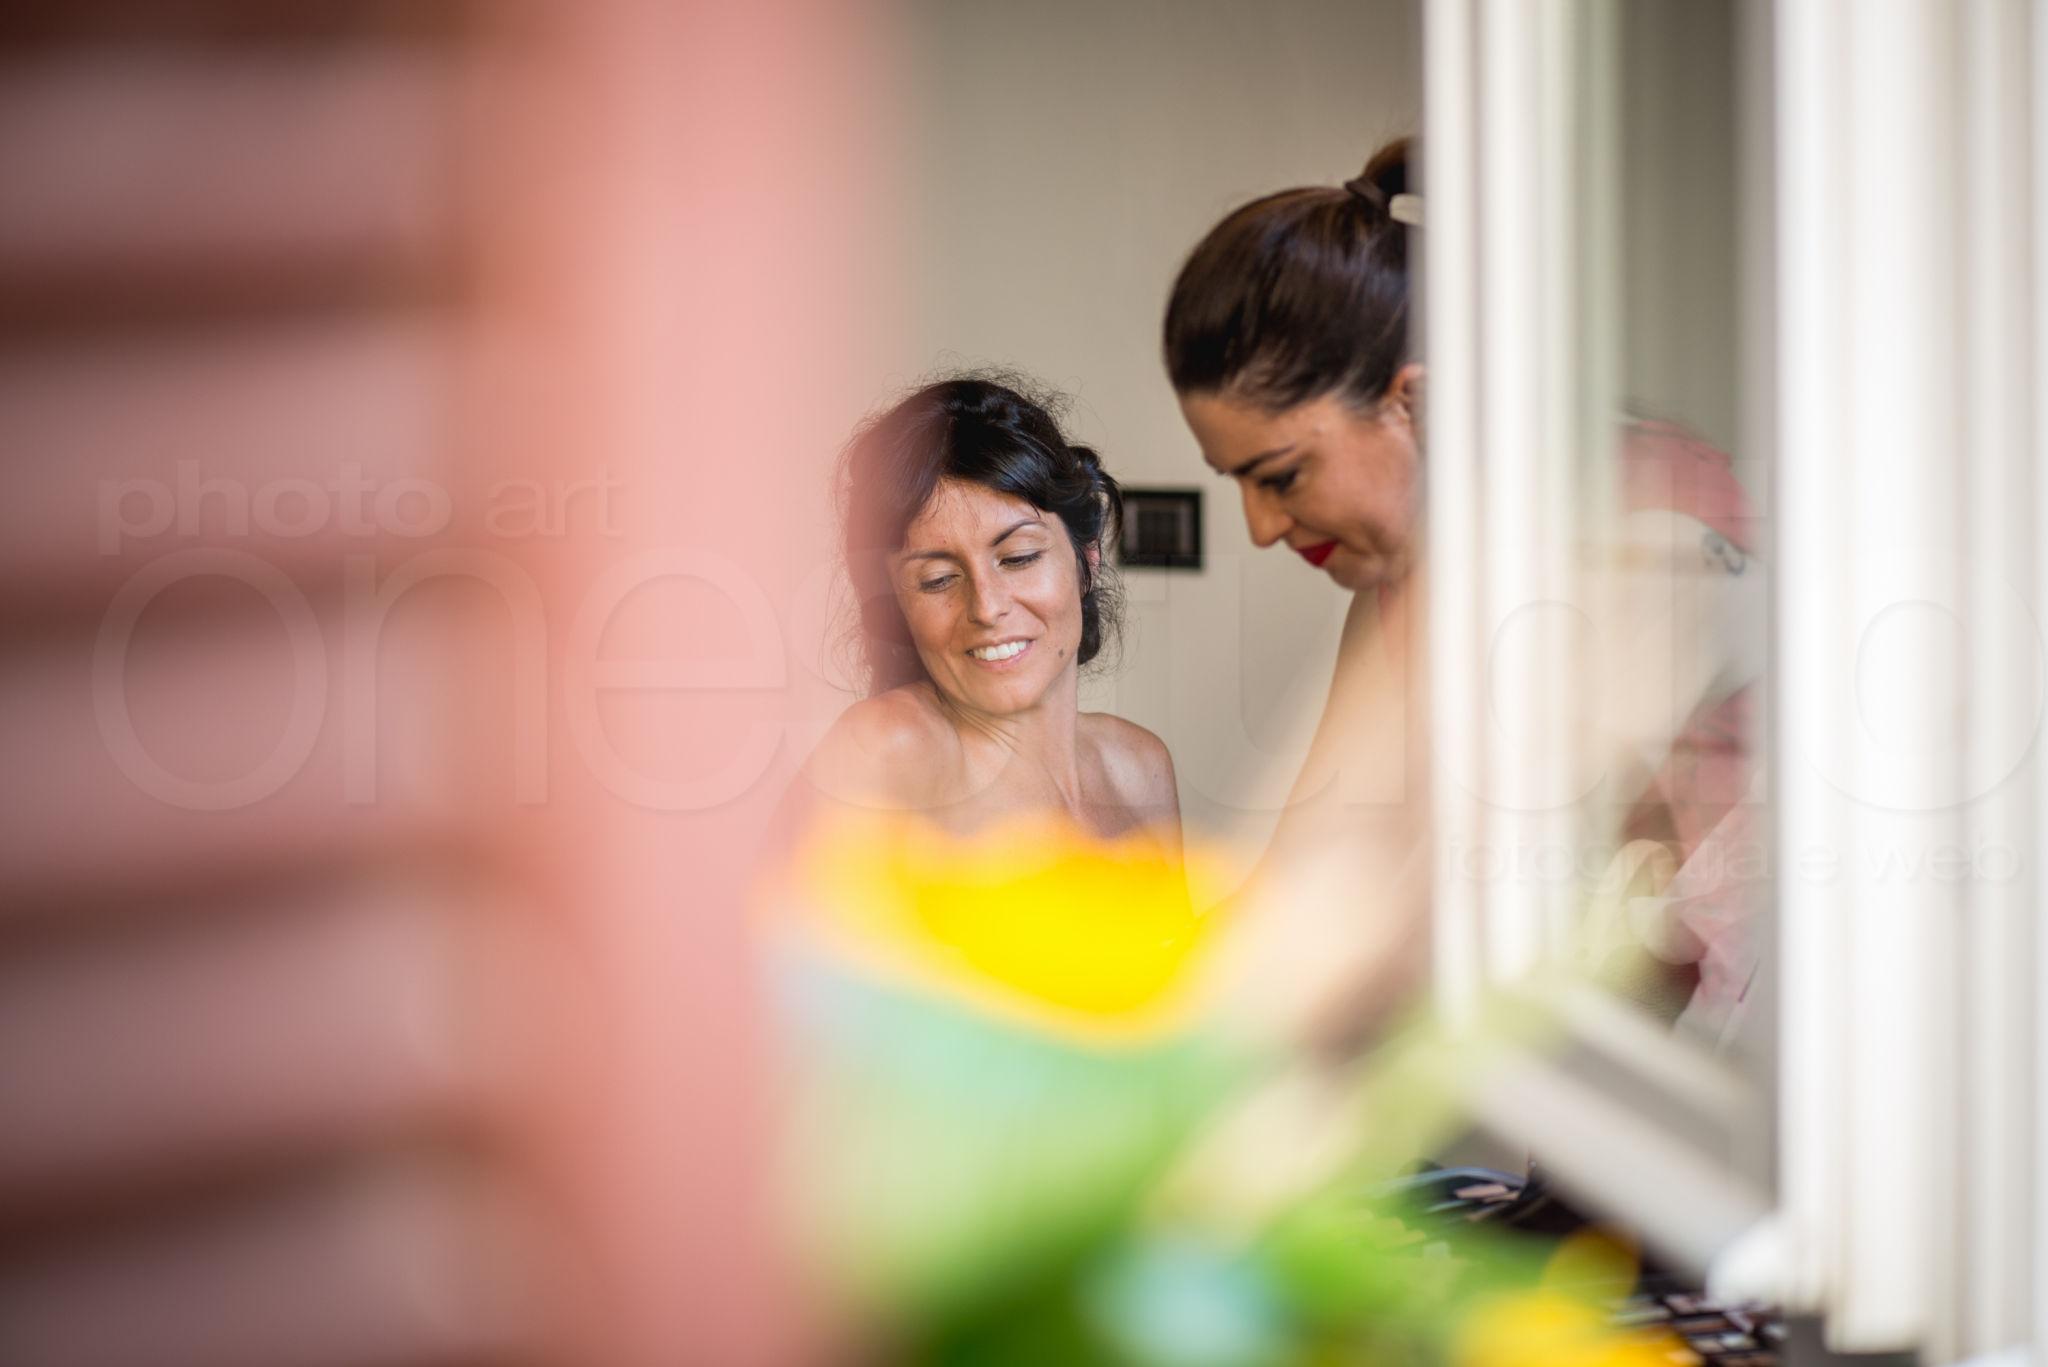 https://lnx.mirkone.it/wp-content/uploads/2015/07/fotografo-matrimoni-faenza-0011.jpg